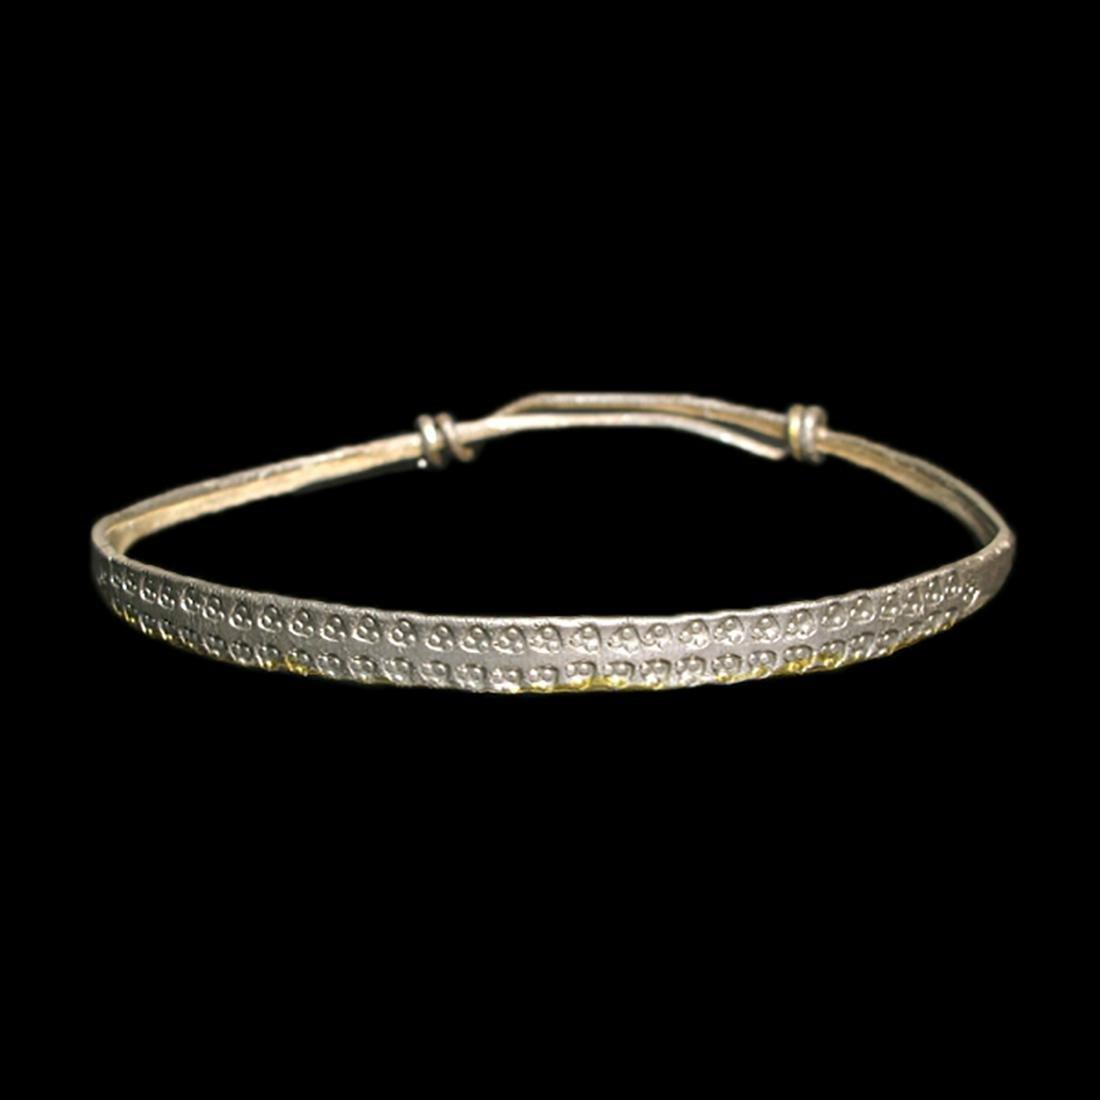 Viking Silver Bracelet, c. 10th - 12th Century A.D.